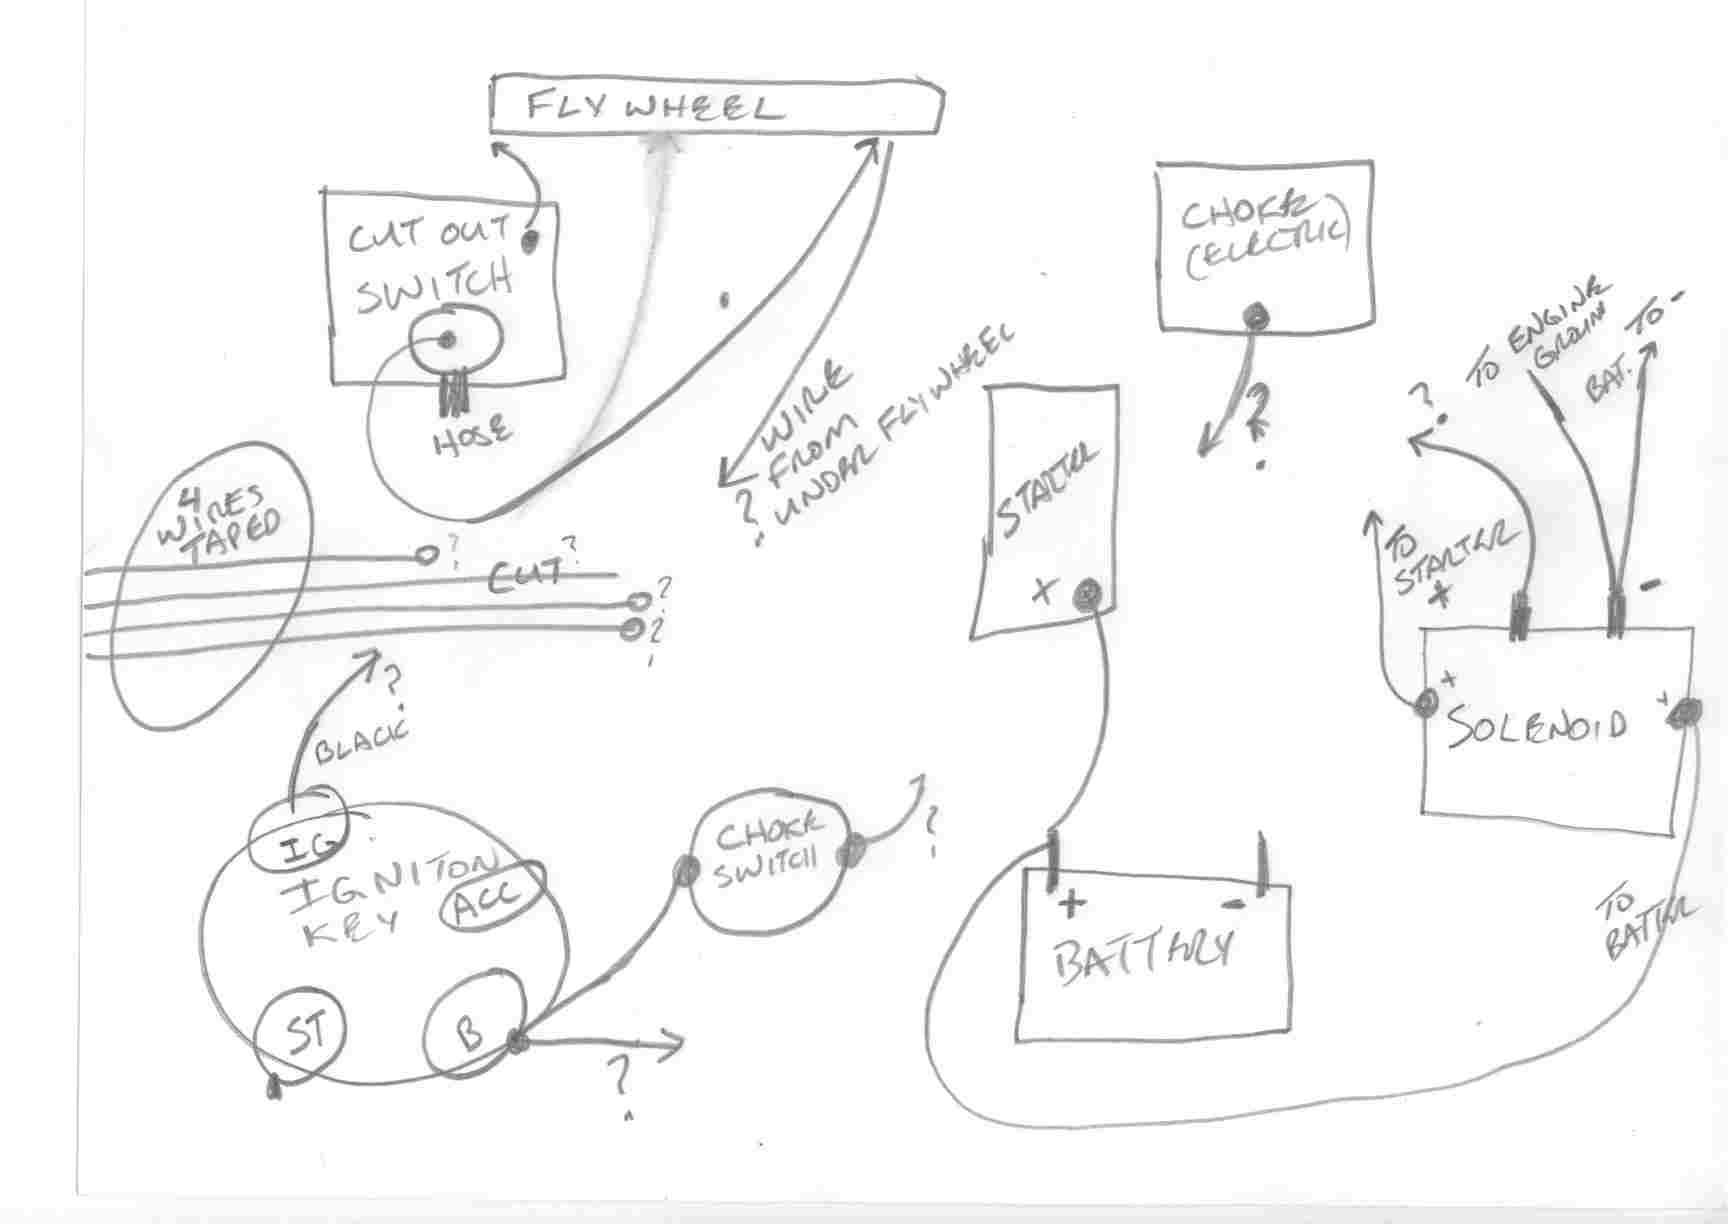 FR_3270] Evinrude Big Twin Wiring Diagram Schematic WiringSeve Dupl Trofu Unnu Hisre Atolo Elinu Dimet Seve Mohammedshrine Librar  Wiring 101